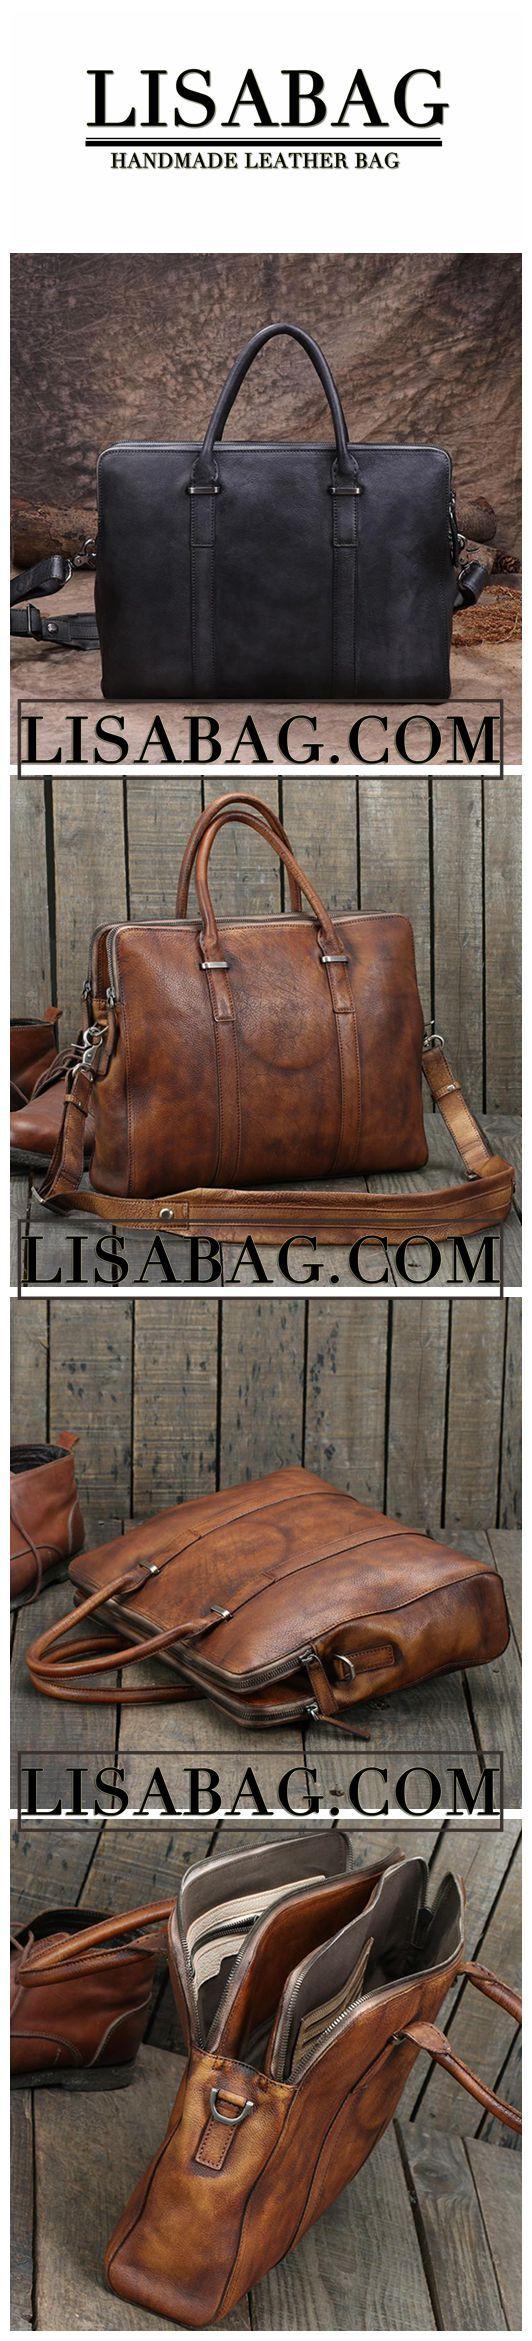 Handmade Gray Leather Briefcase Men's Business Bag Handbag Fashion Laptop Bag 14119